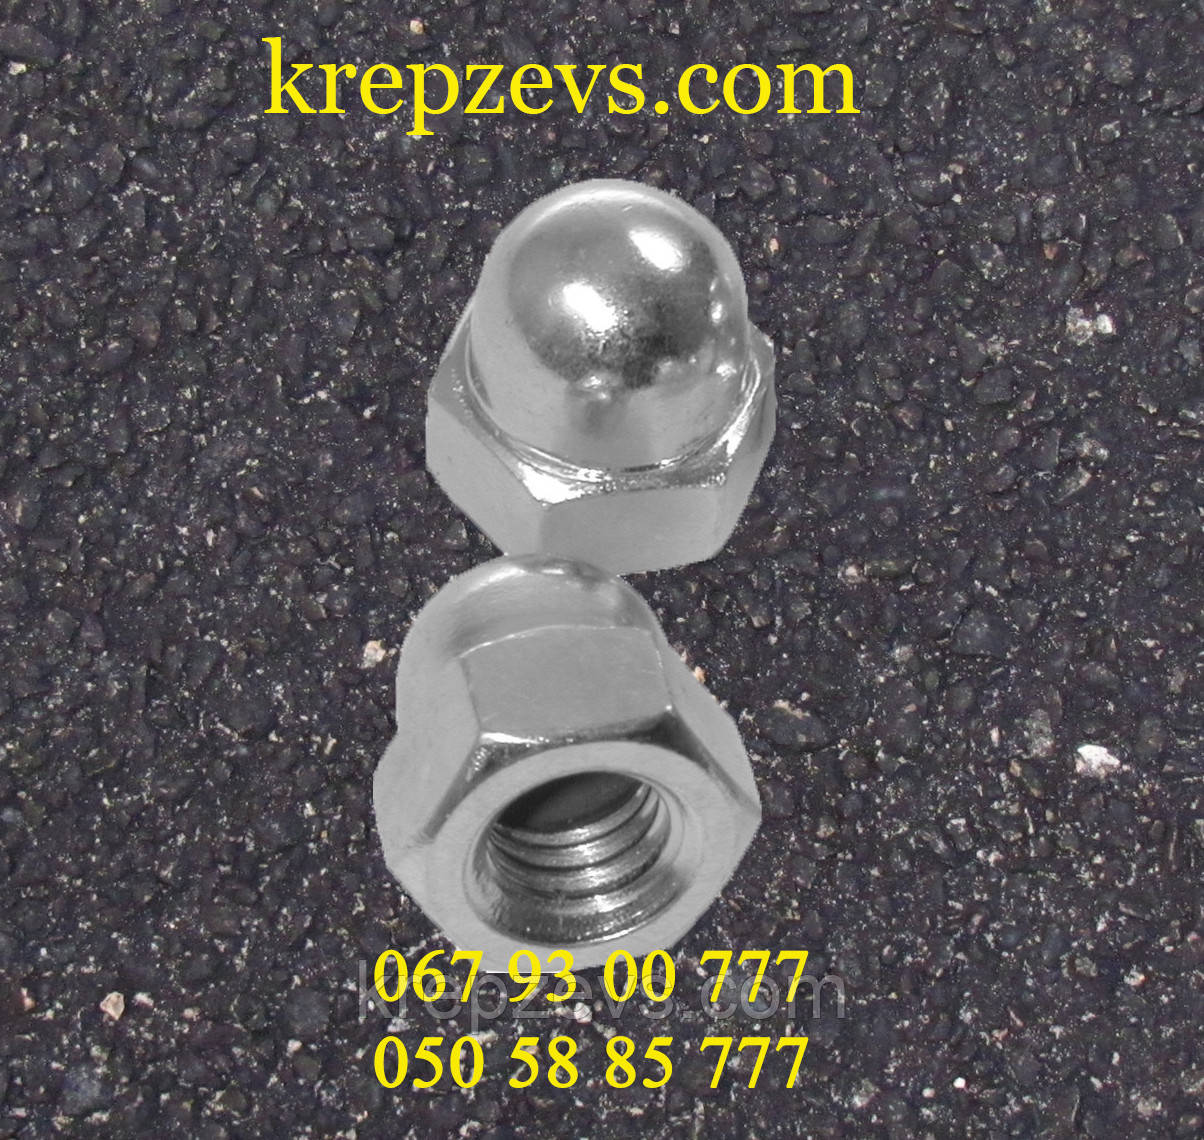 Гайка колпачковая М16 шаг 1,5 ГОСТ 11860-85, DIN 1587